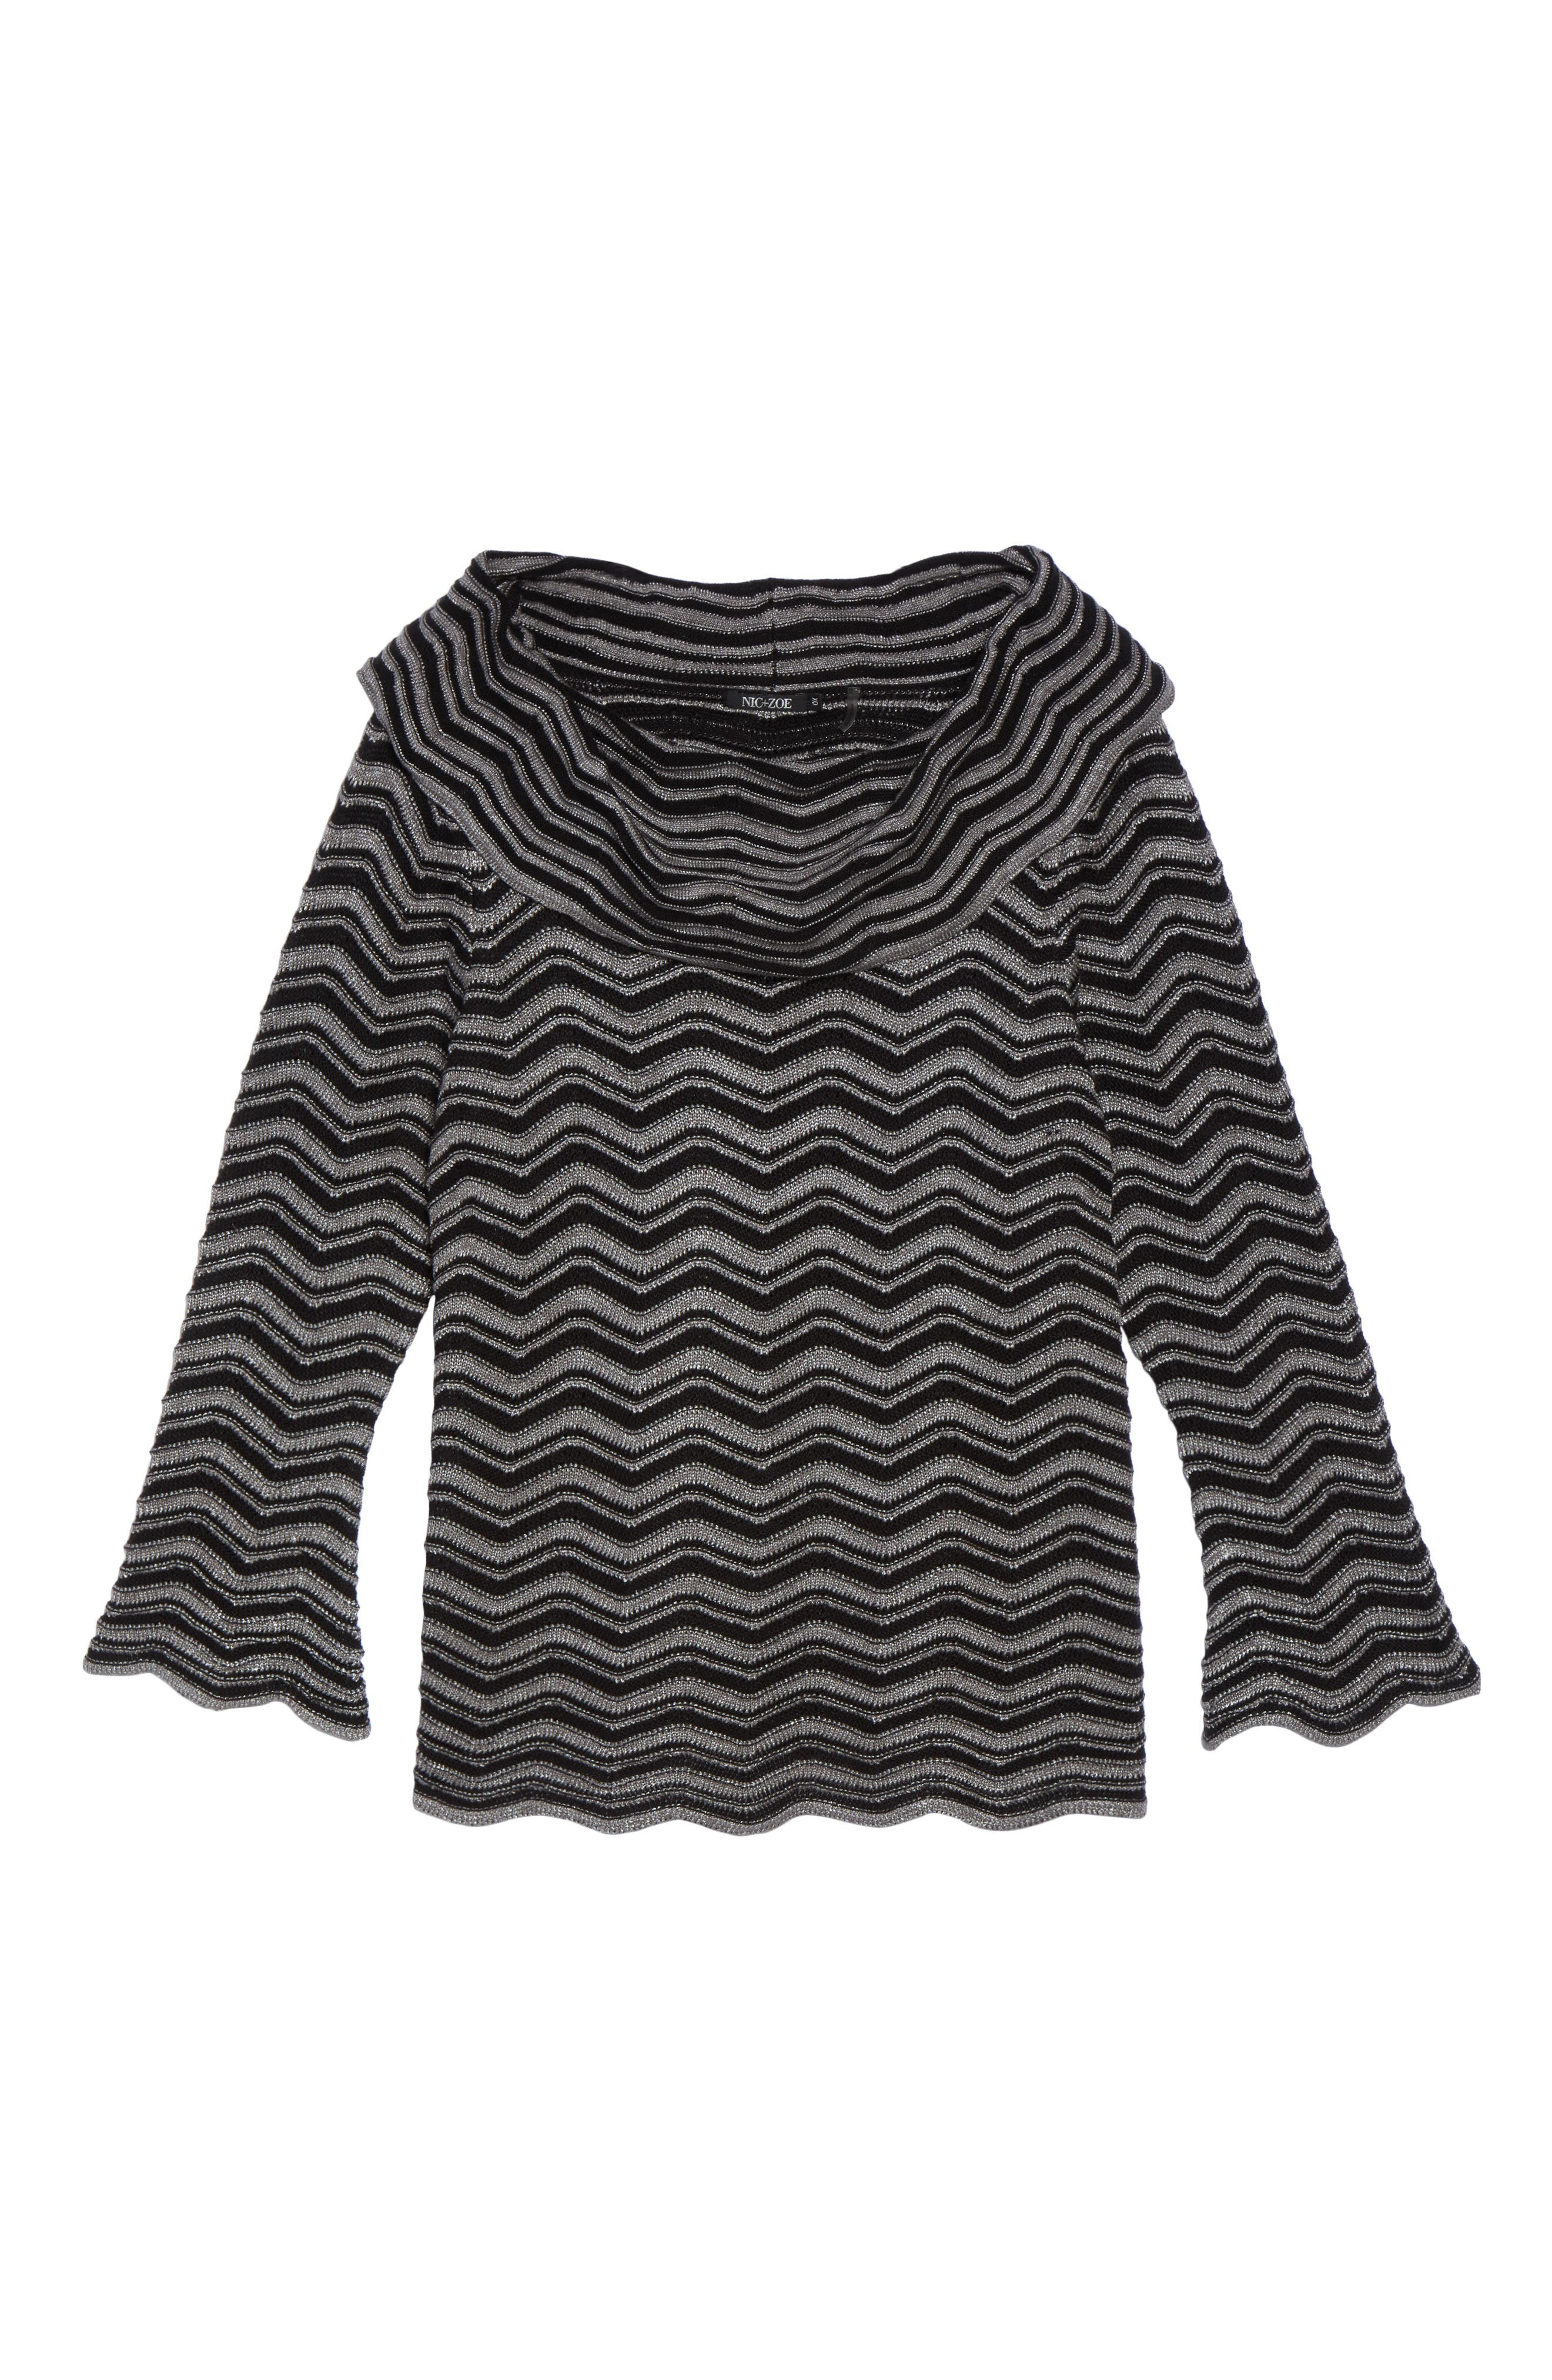 Zigzag Stripe Sweater,                             Alternate thumbnail 6, color,                             004